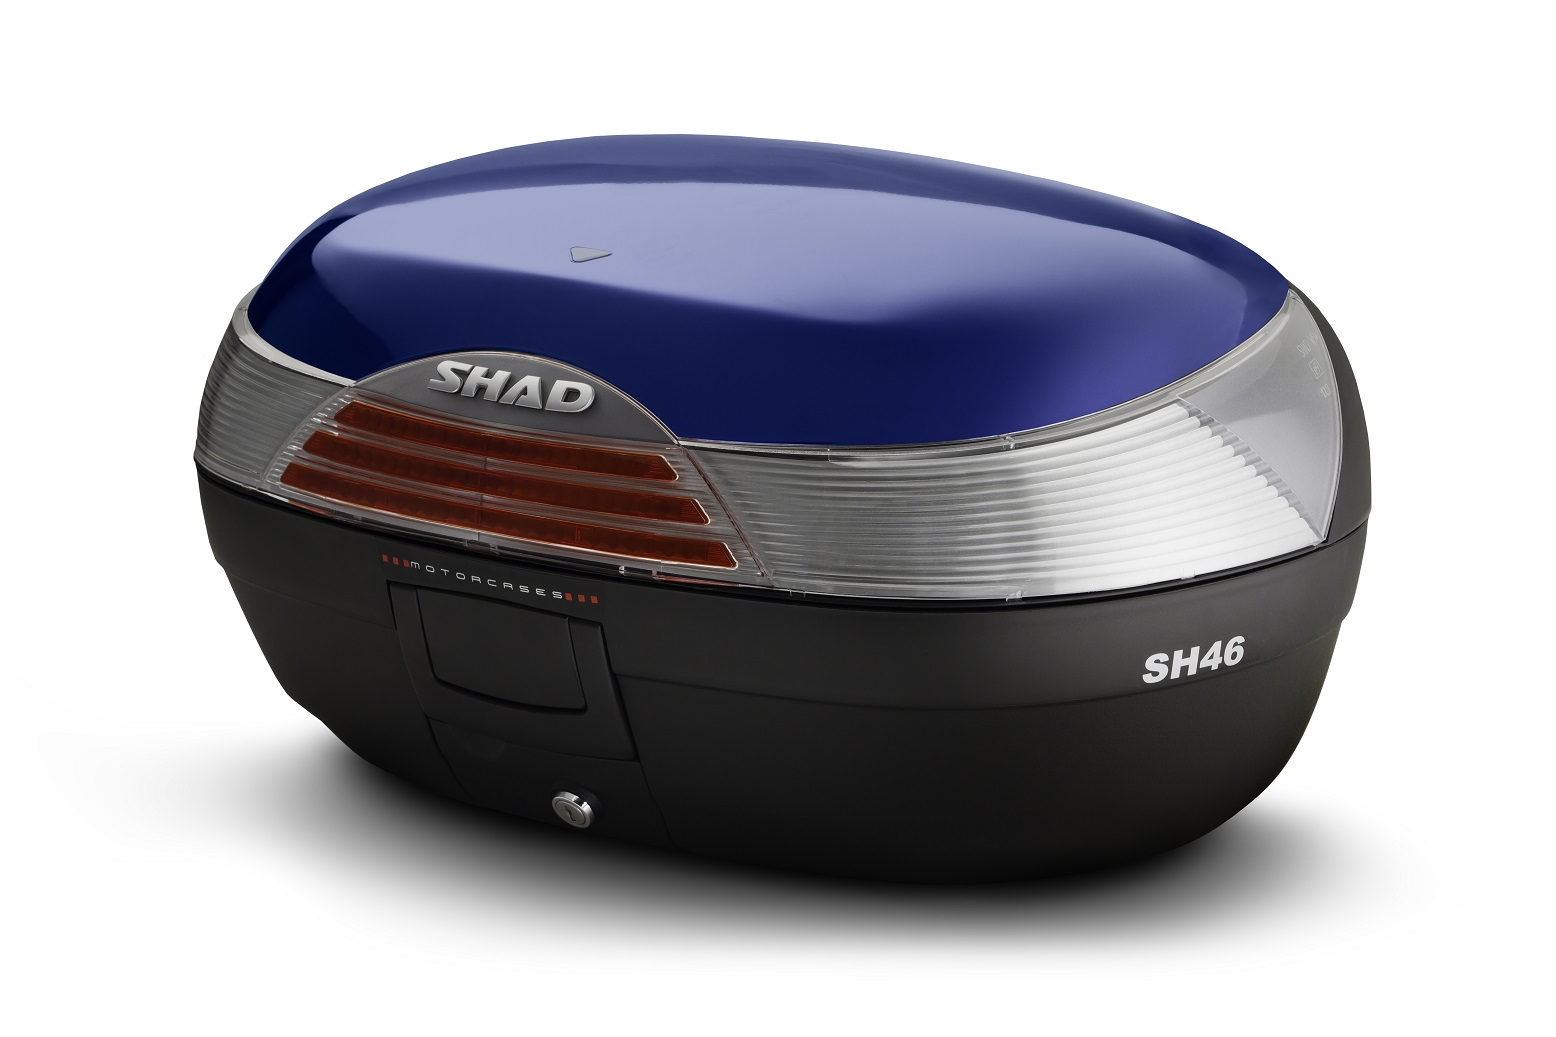 centrin daiktad top case shad sh46 46l. Black Bedroom Furniture Sets. Home Design Ideas